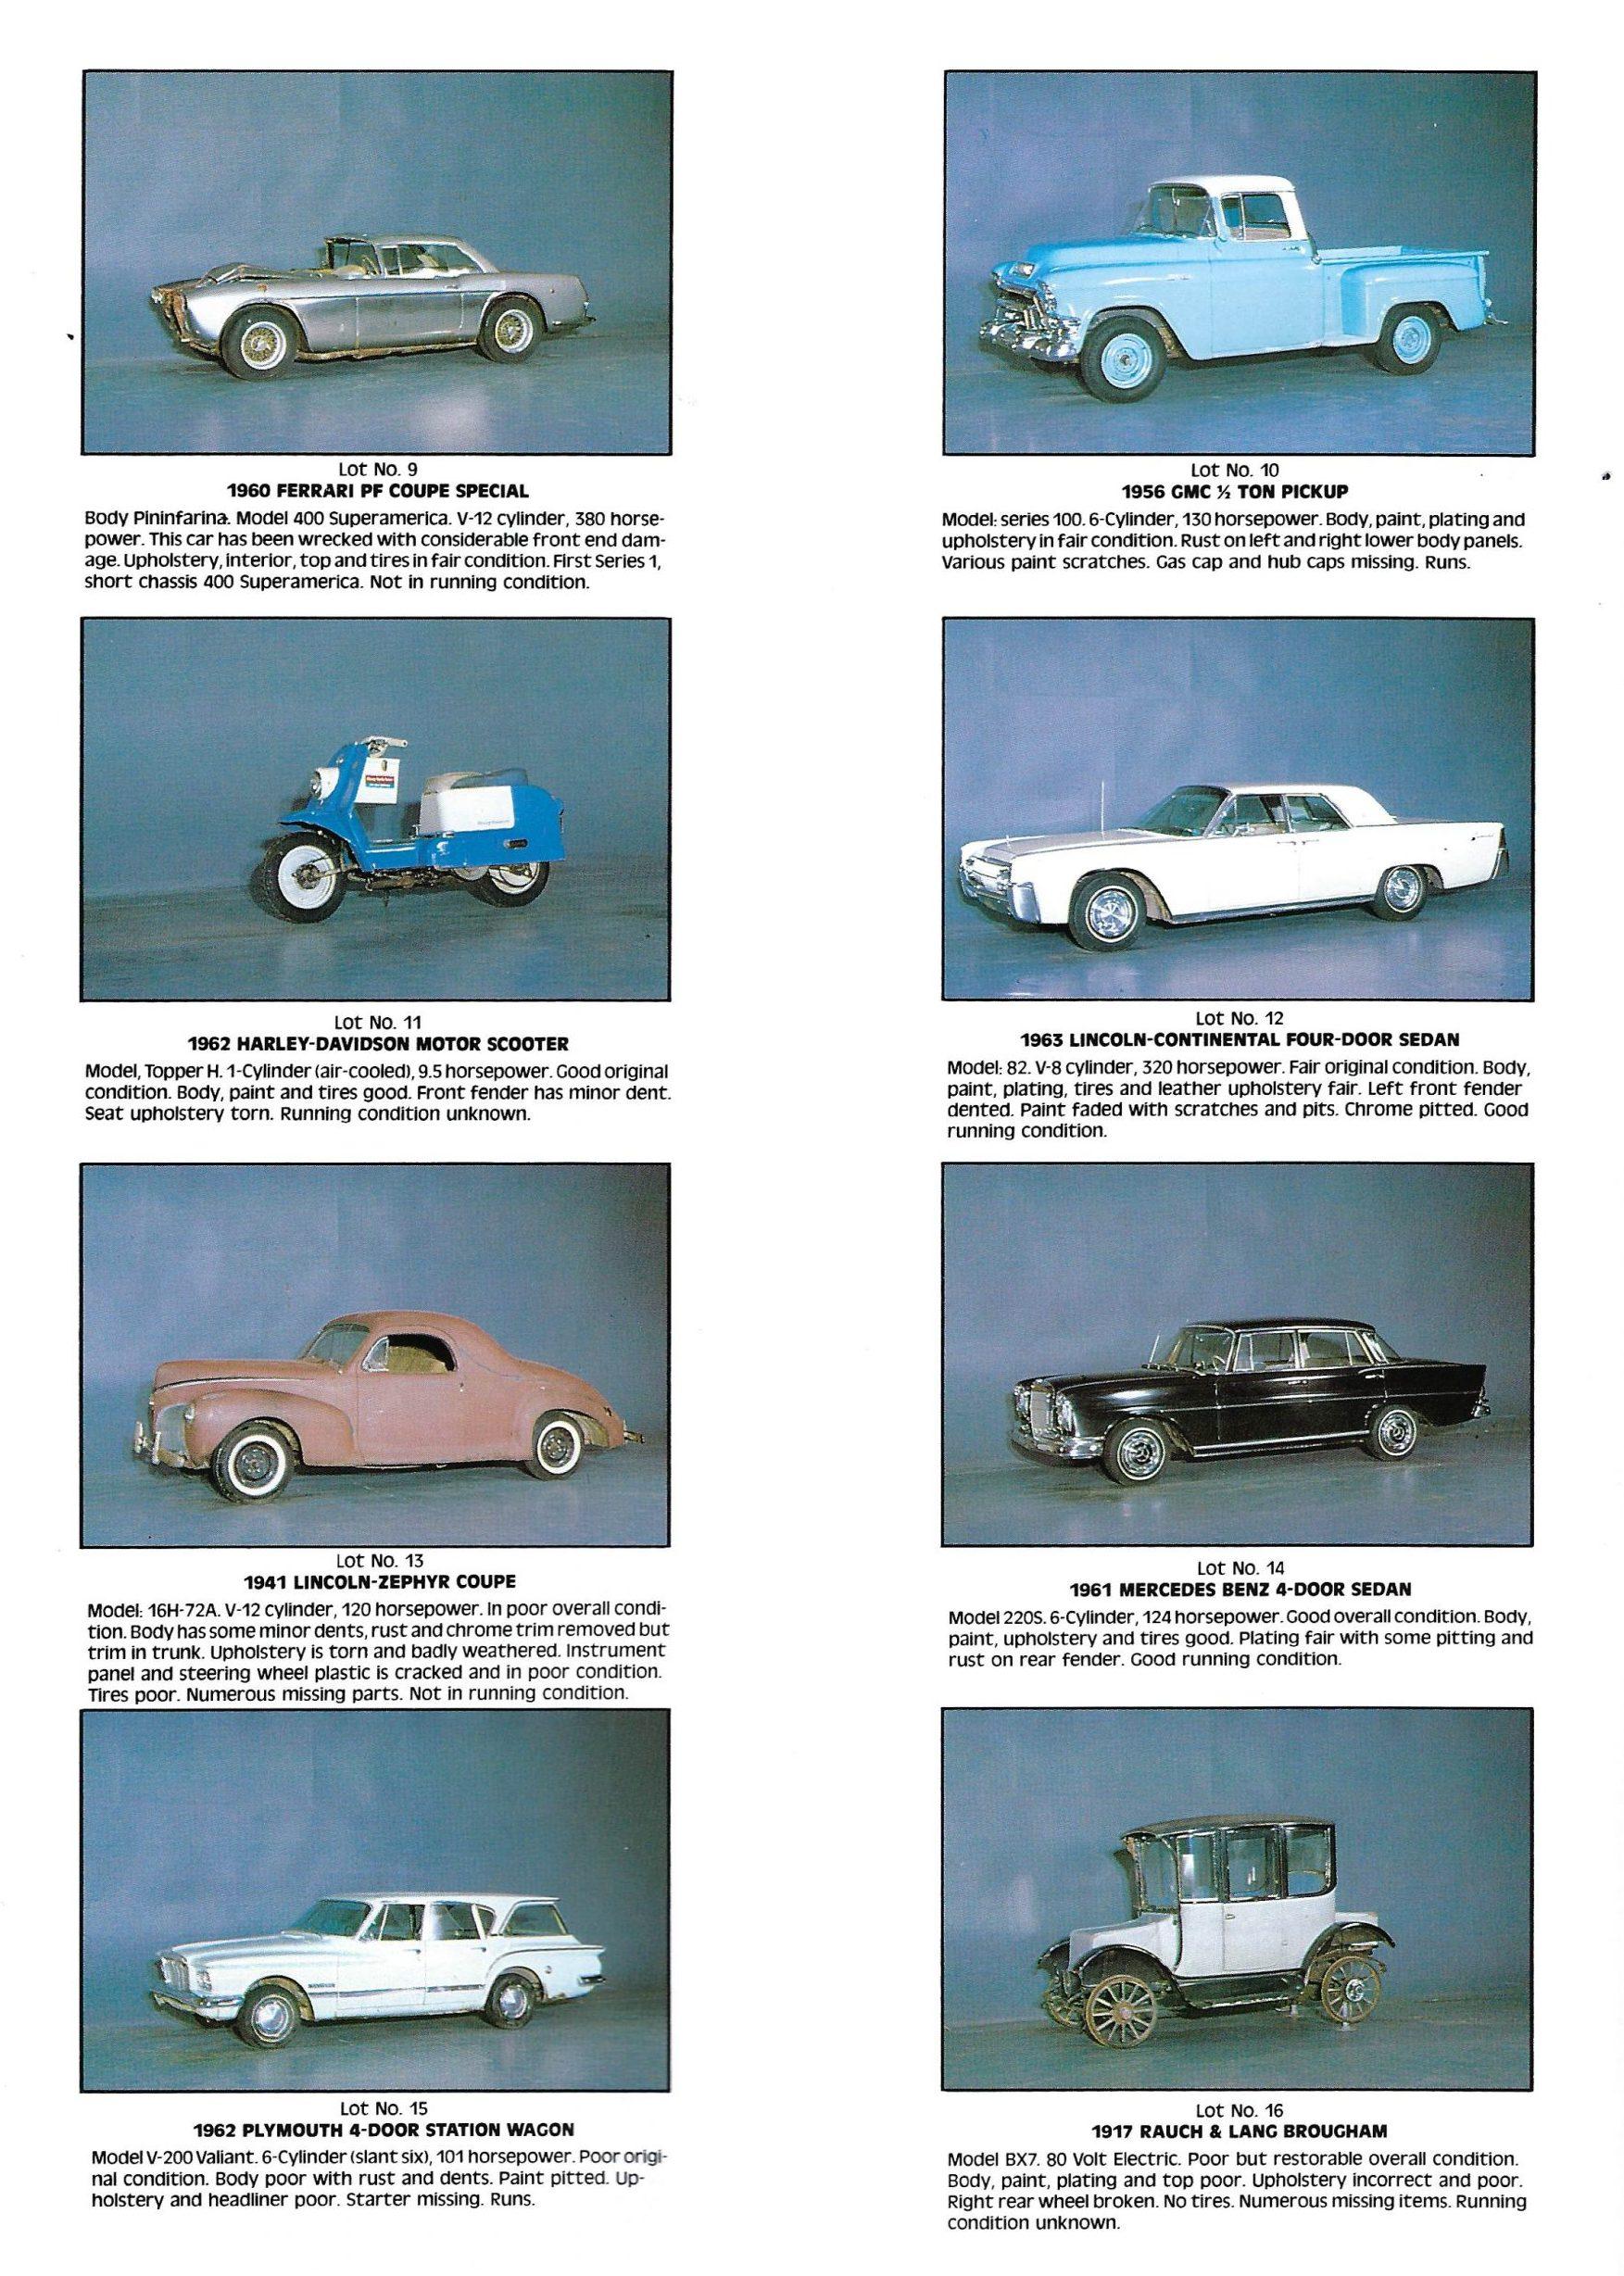 Auction-Magazines listings